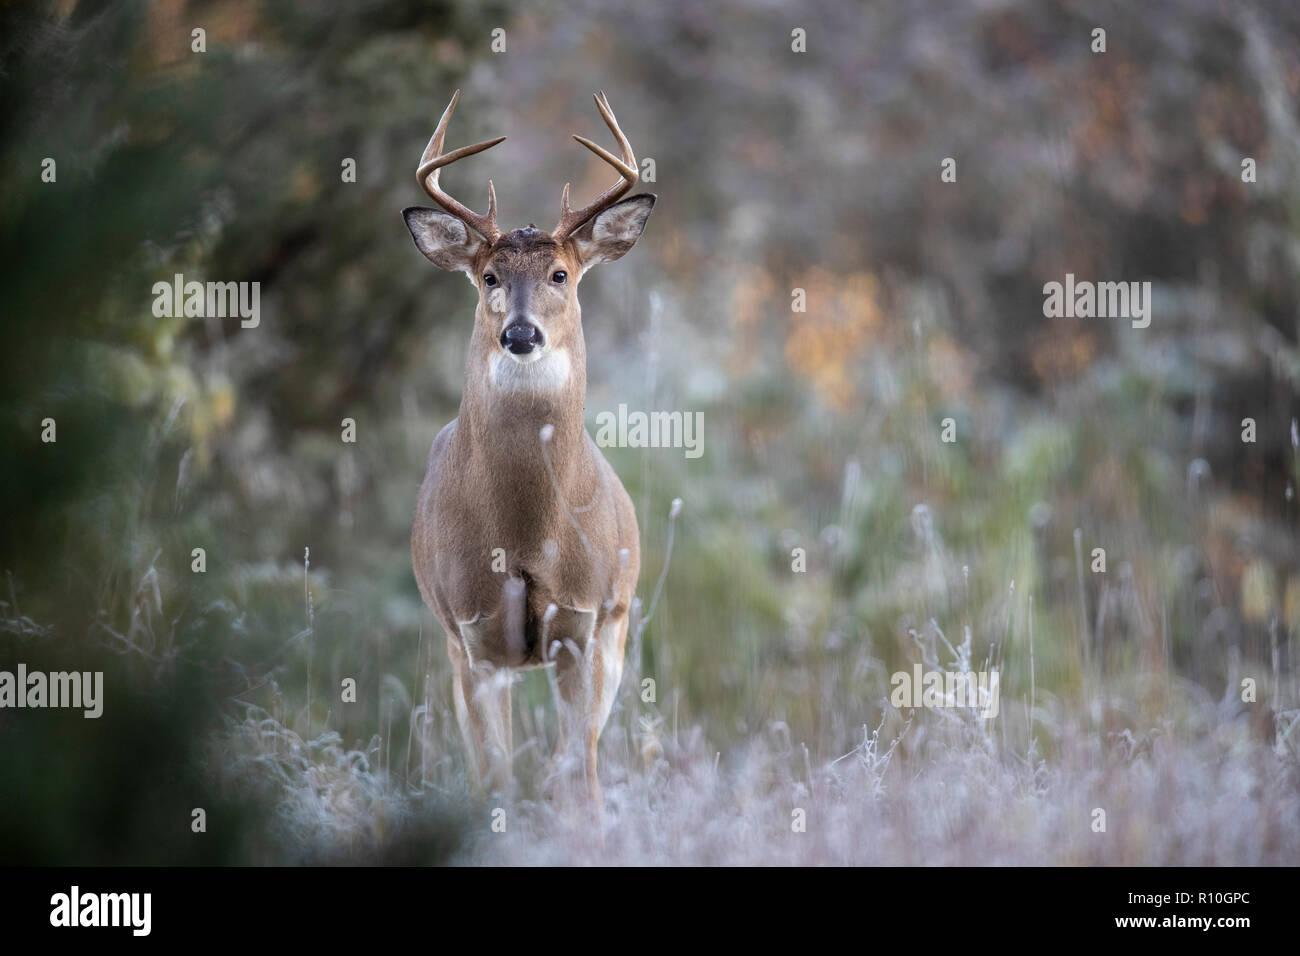 A curious buck whitetail deer looking alert. - Stock Image